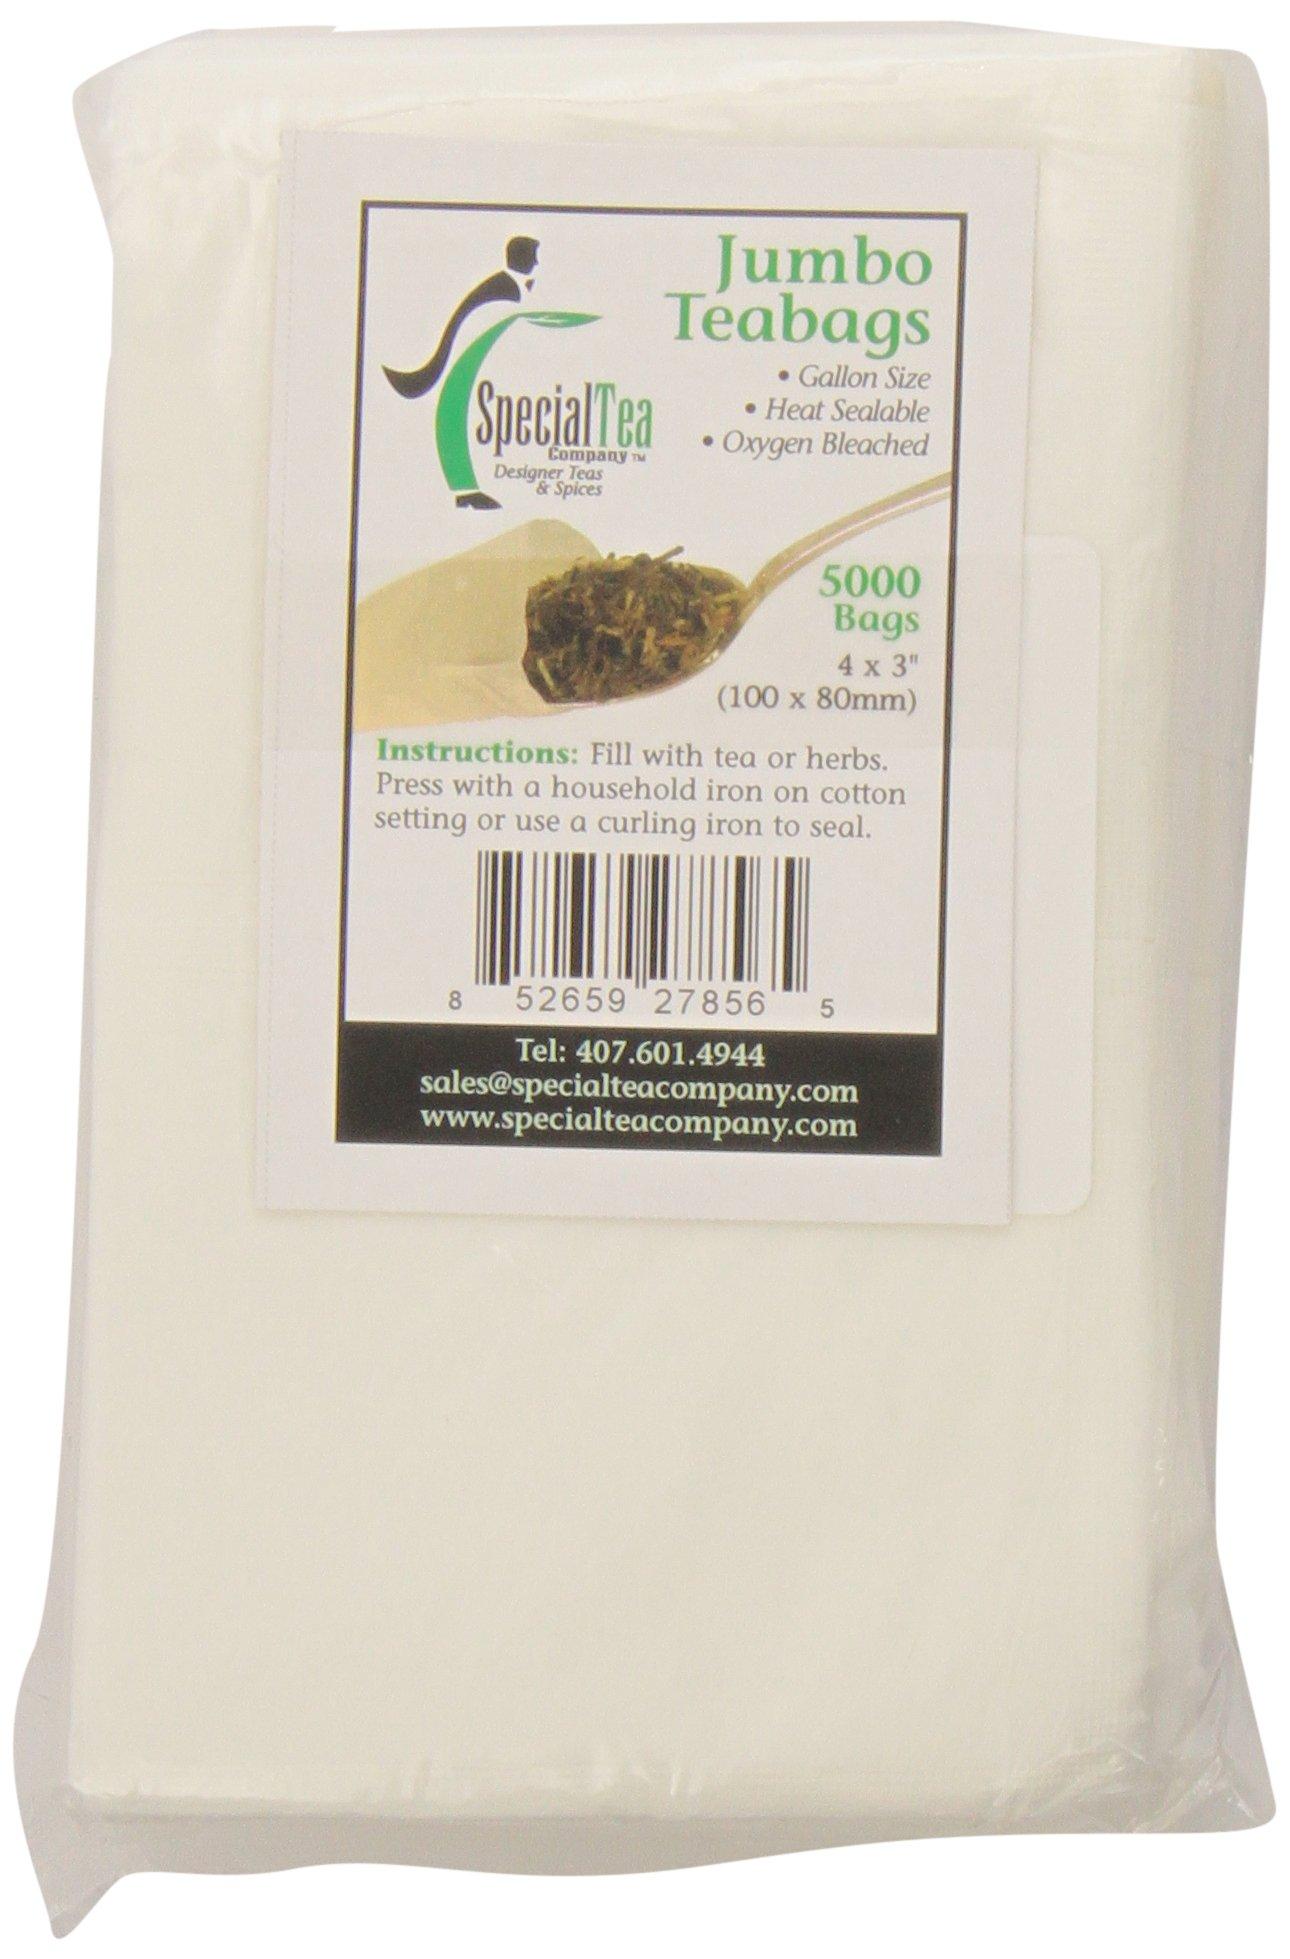 Special Tea Company 4 by 3-Inch 5000-Piece Empty Tea/Herbs Bags, Jumbo